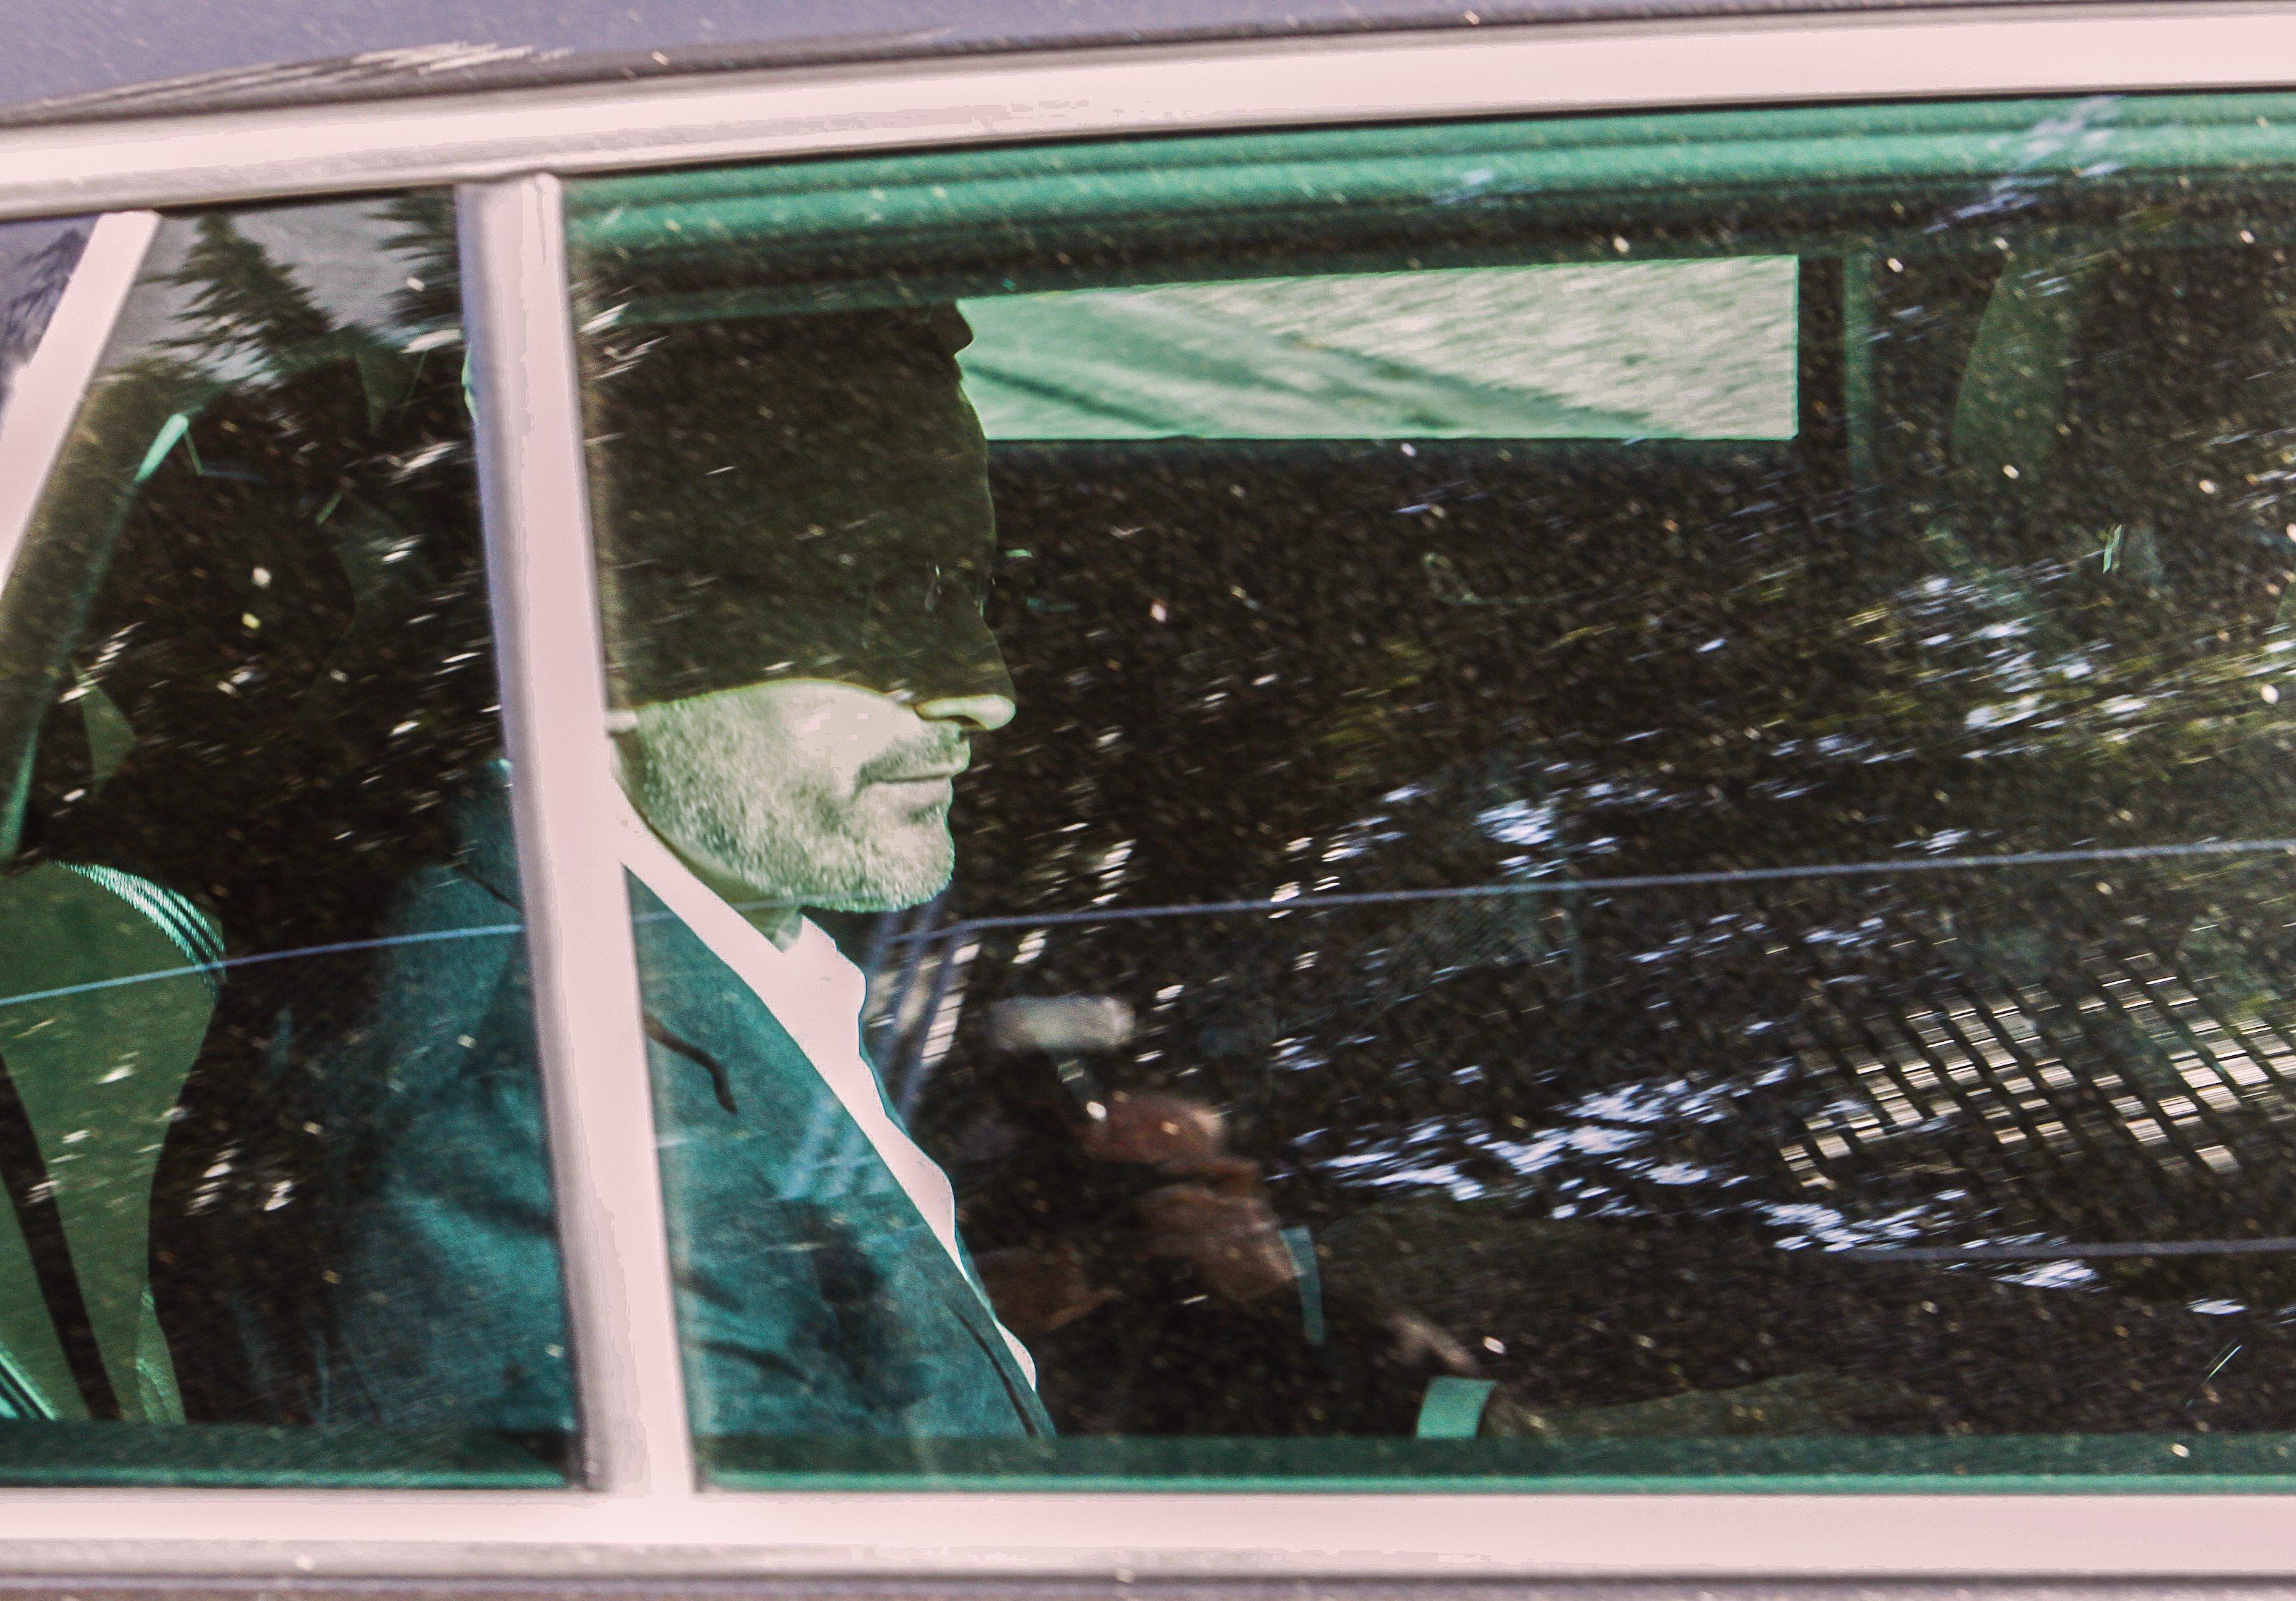 Zagreb, 201017. Savska 41,  Ante Todoric priveden je na saslusanje u Drzavno odvjetnistvo RH. Na fotografiji: Ante Todoric izlazi iz zgrade odvjetnistva. Foto: Zeljko Puhovski / CROPIX